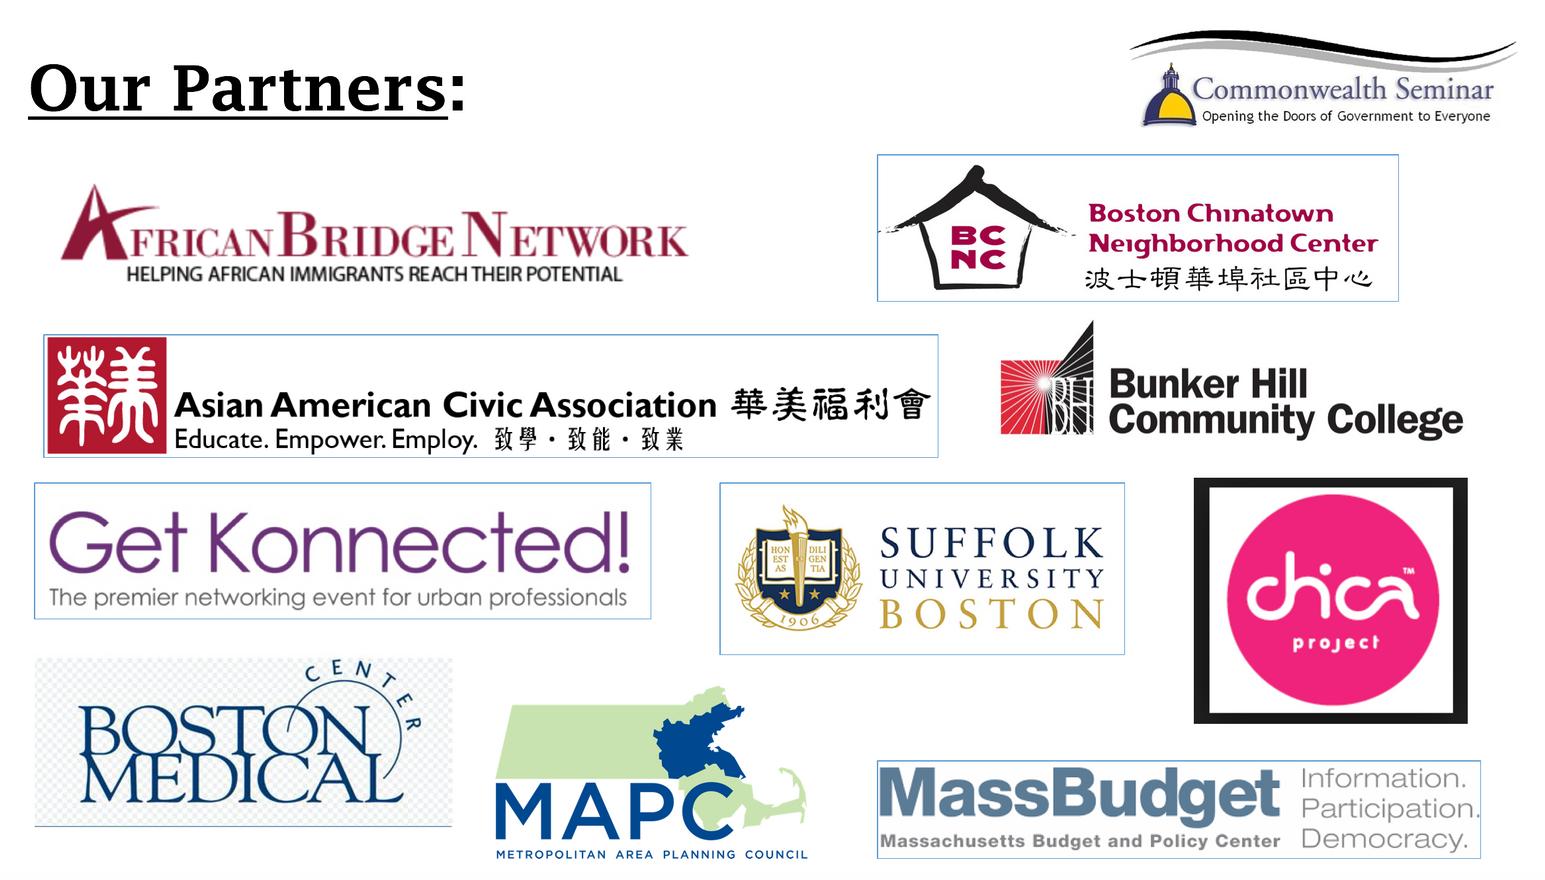 Commonwealth Seminar Partners